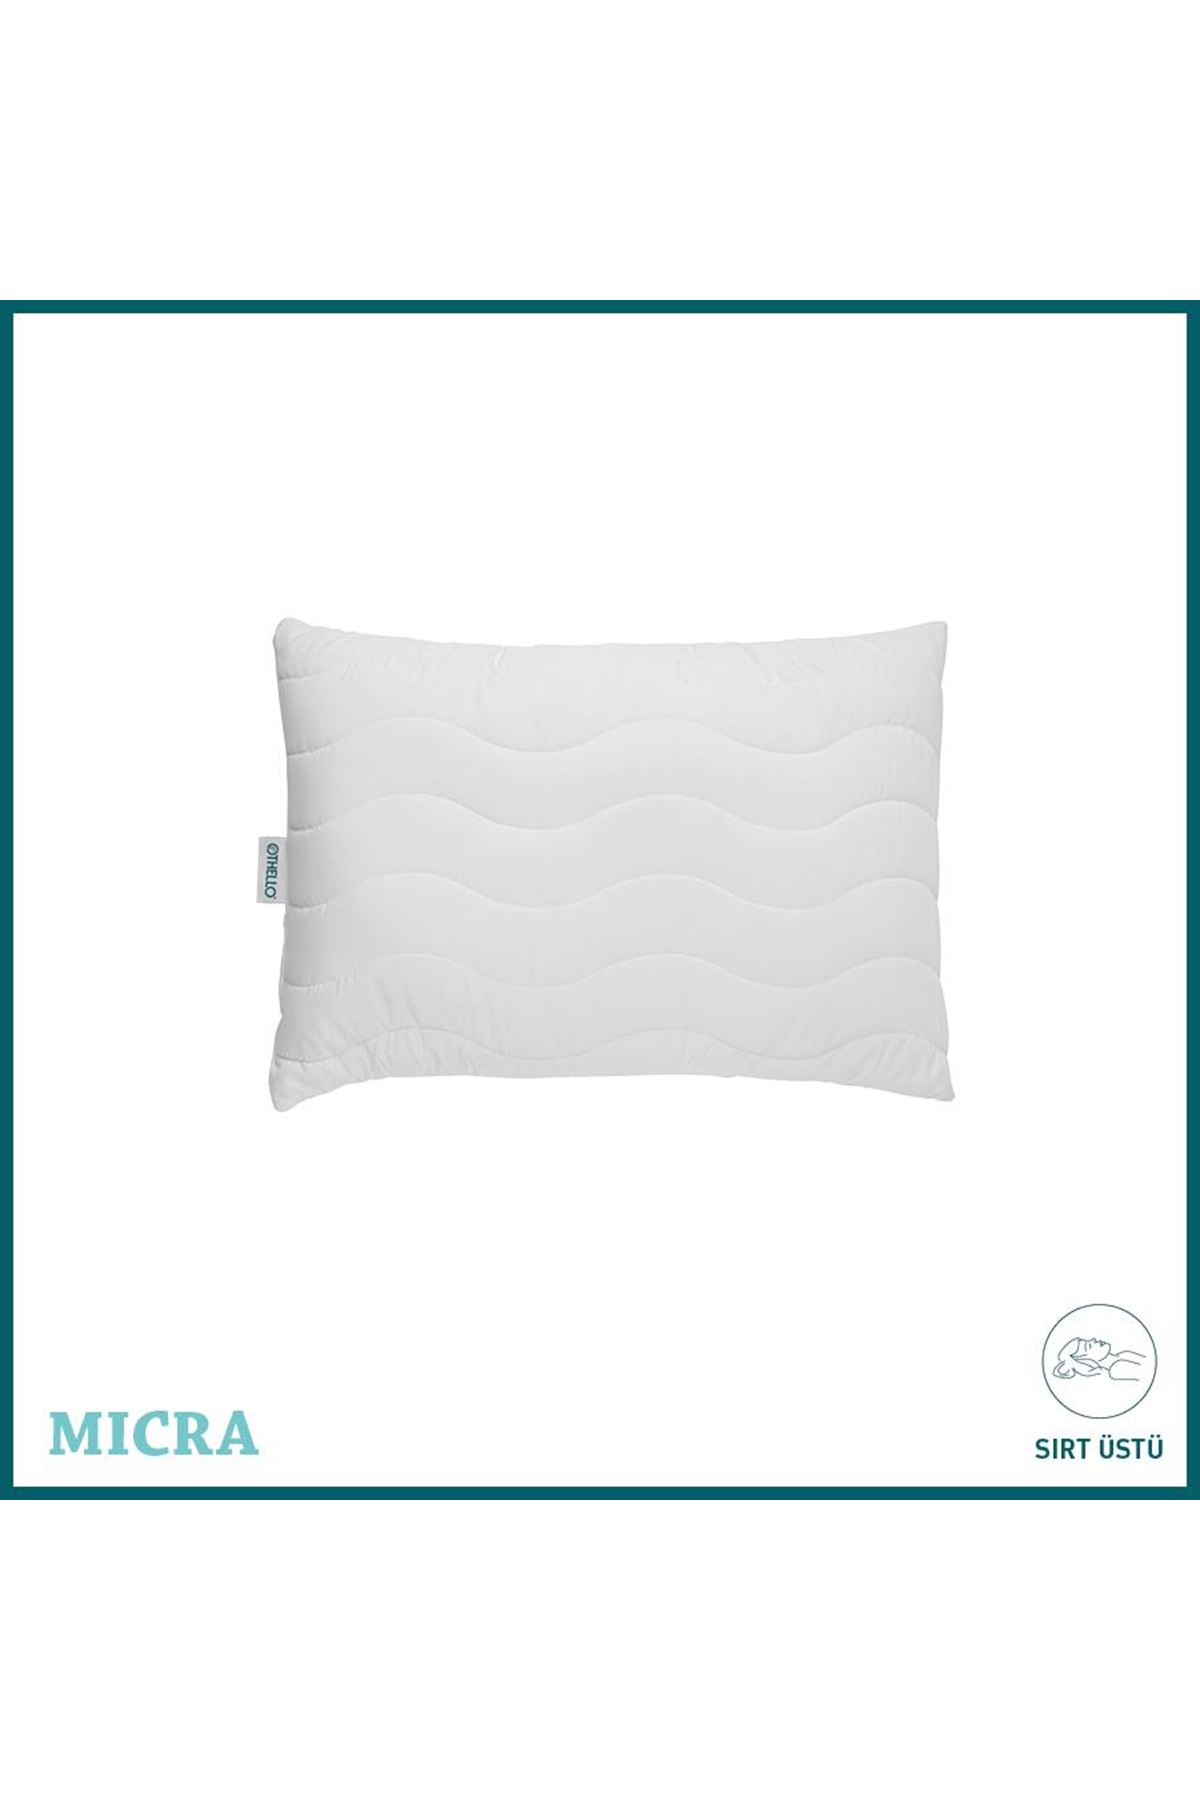 Othello Classico Micra Mikro Elyaf Kapitoneli Yastık 50x70